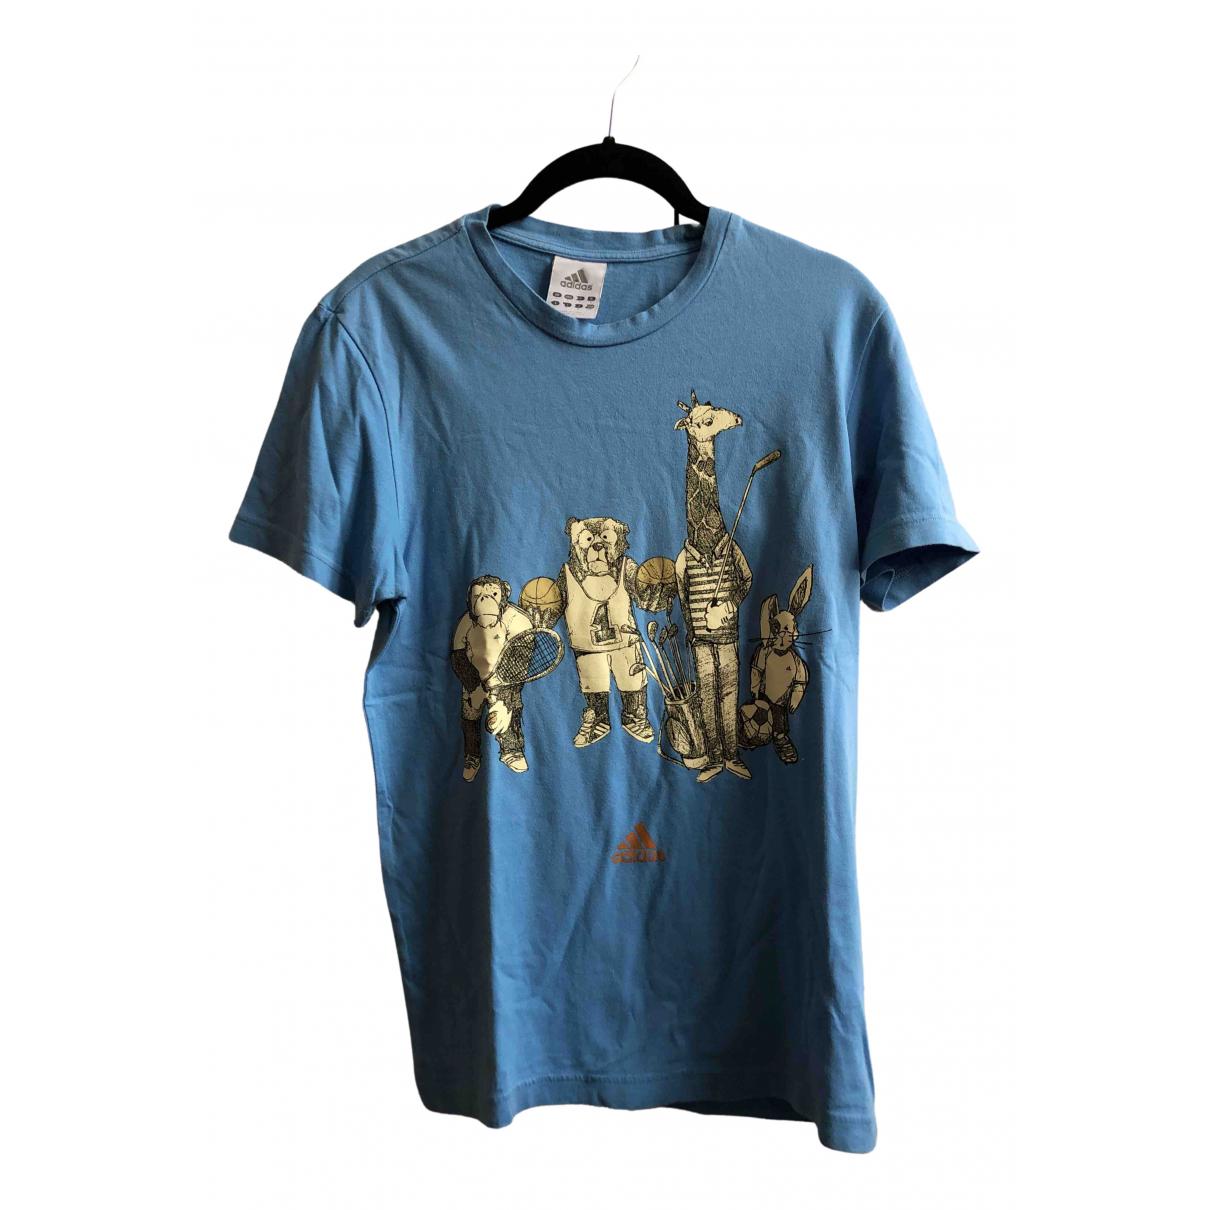 Adidas - Tee shirts   pour homme en coton - turquoise